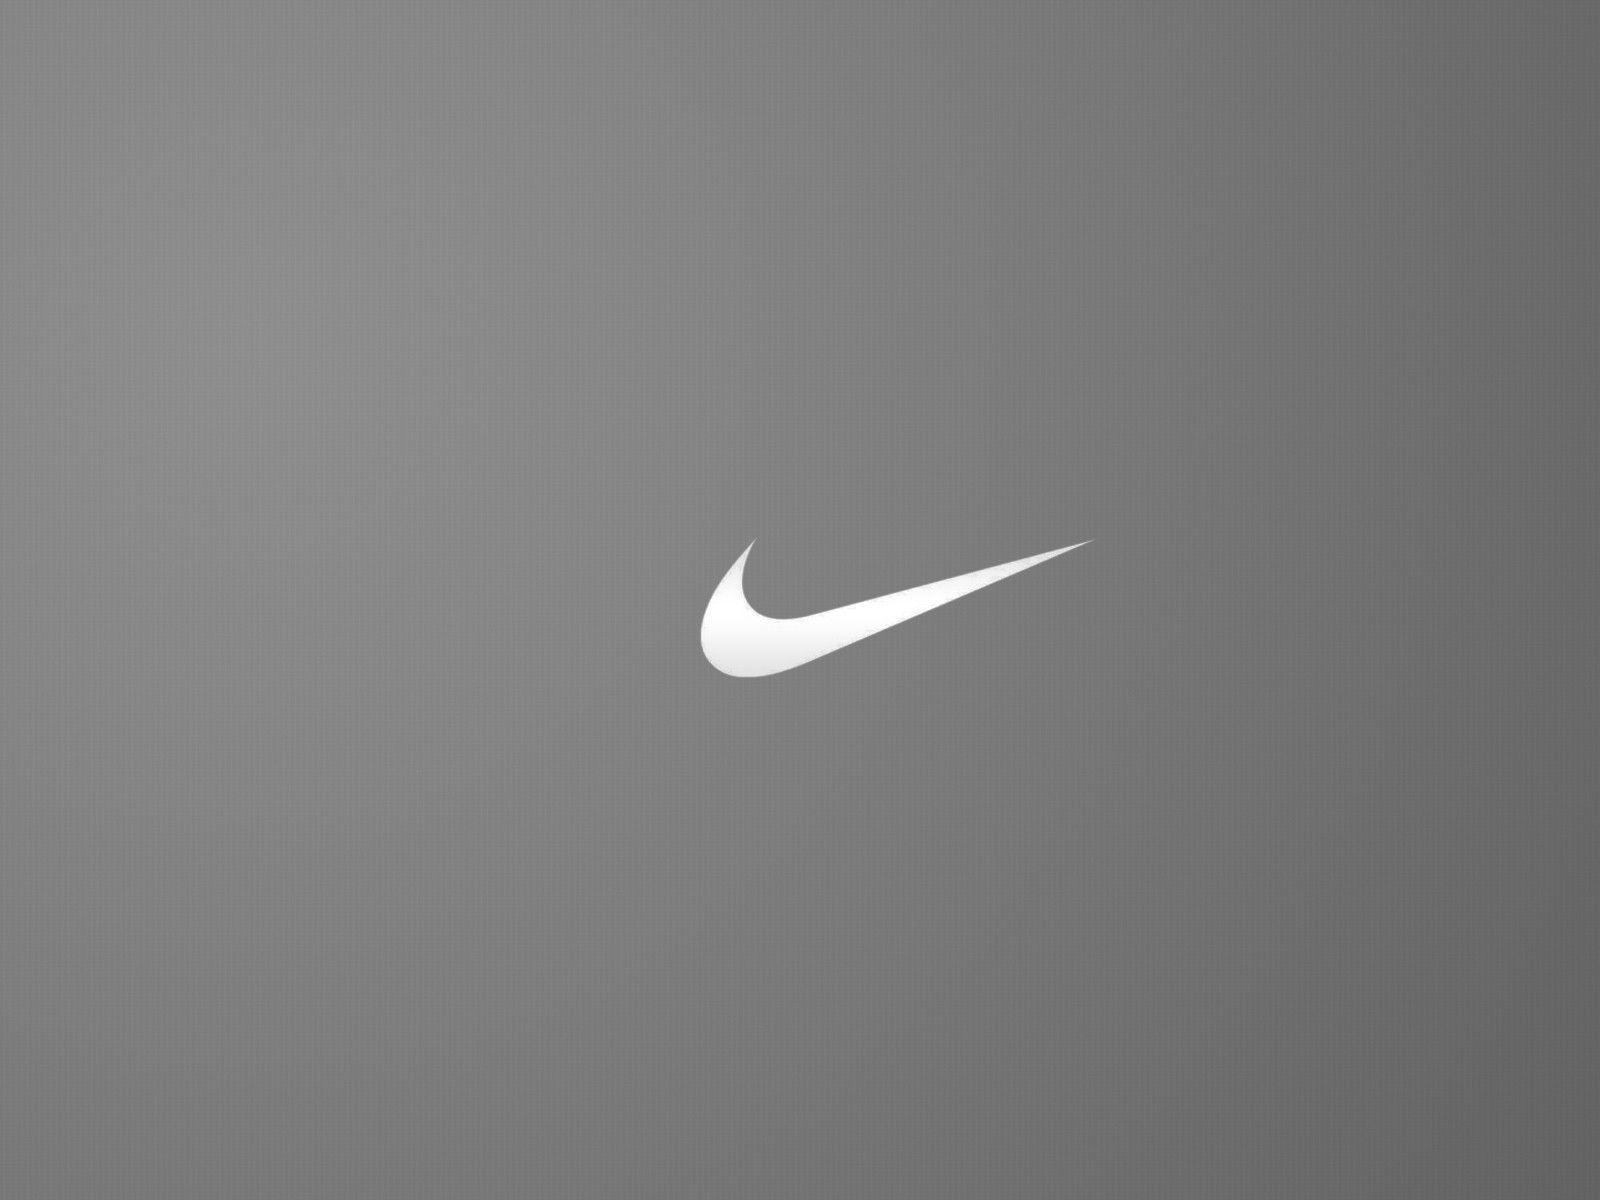 Logo nike wallpaper wallpapersafari - Nike Shoes Wallpaper B